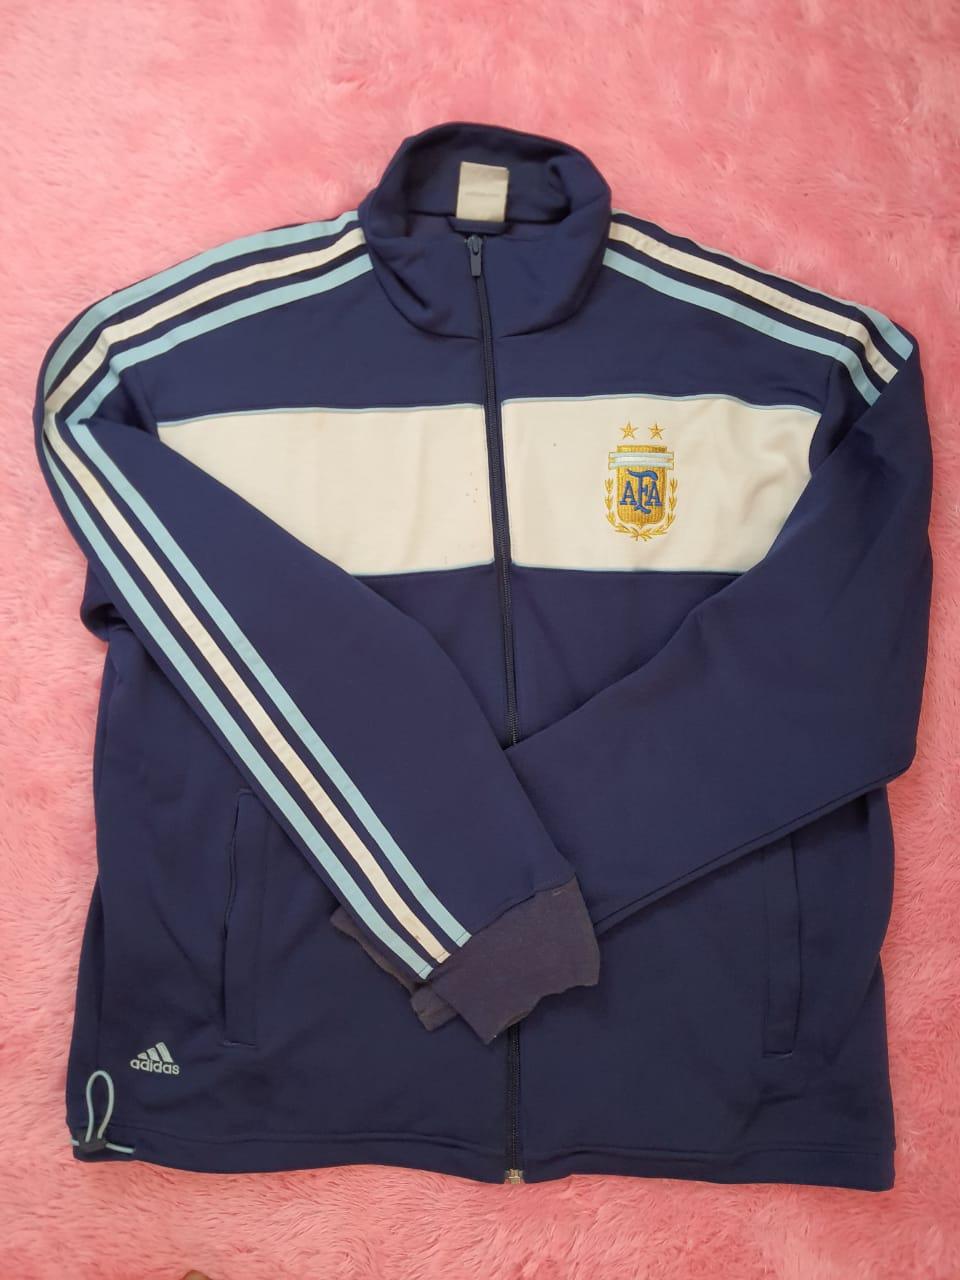 Jaket Adidas Argentina World Cup 2006 (Original)